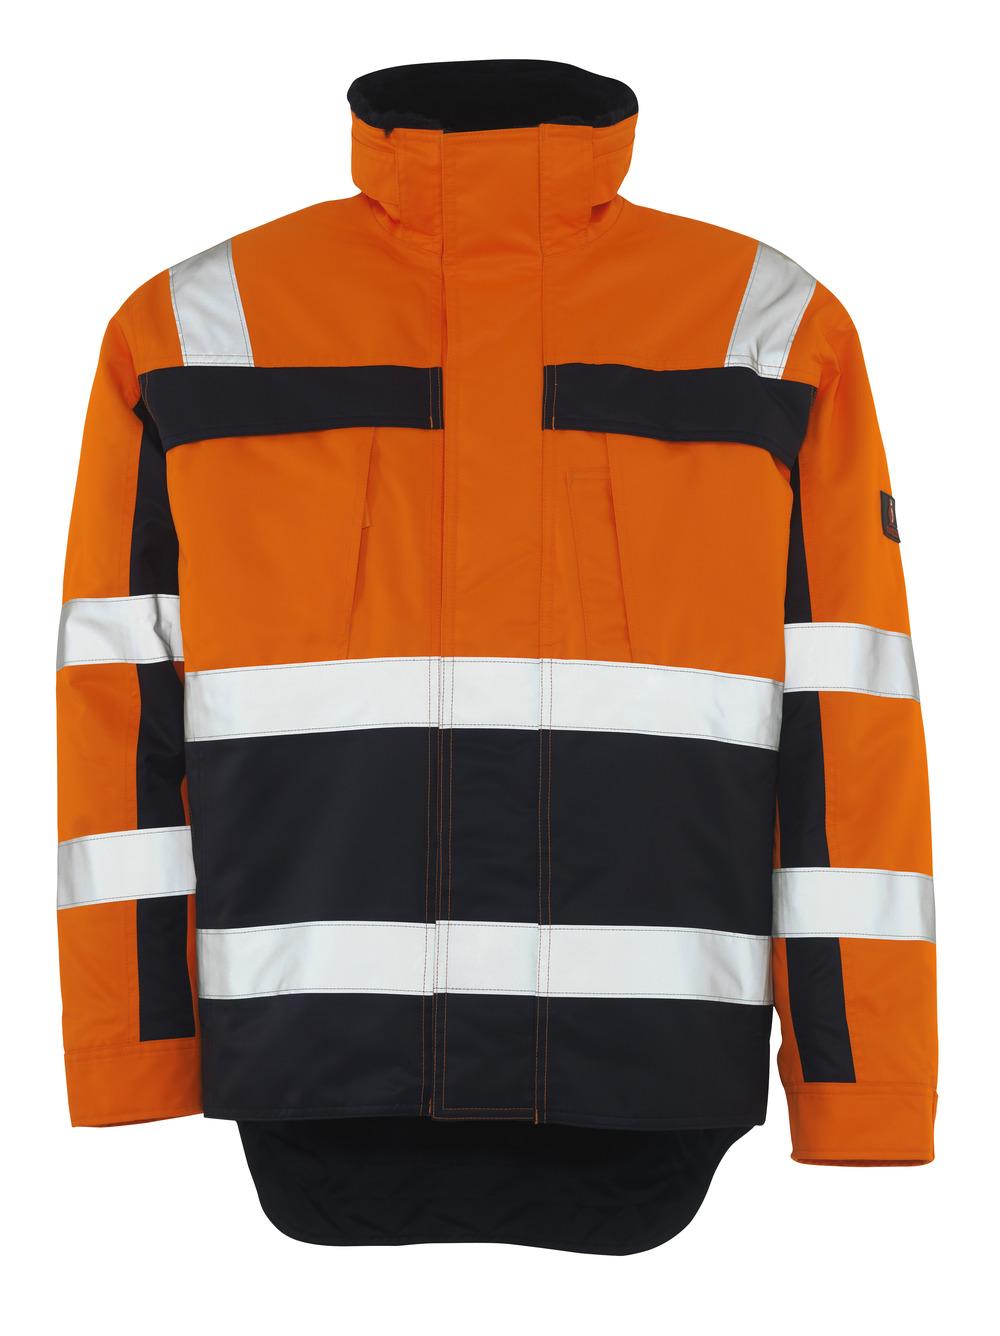 MASCOT Teresina Vinterjakke - 07223-880 - MASCOT® SAFE COMPETE